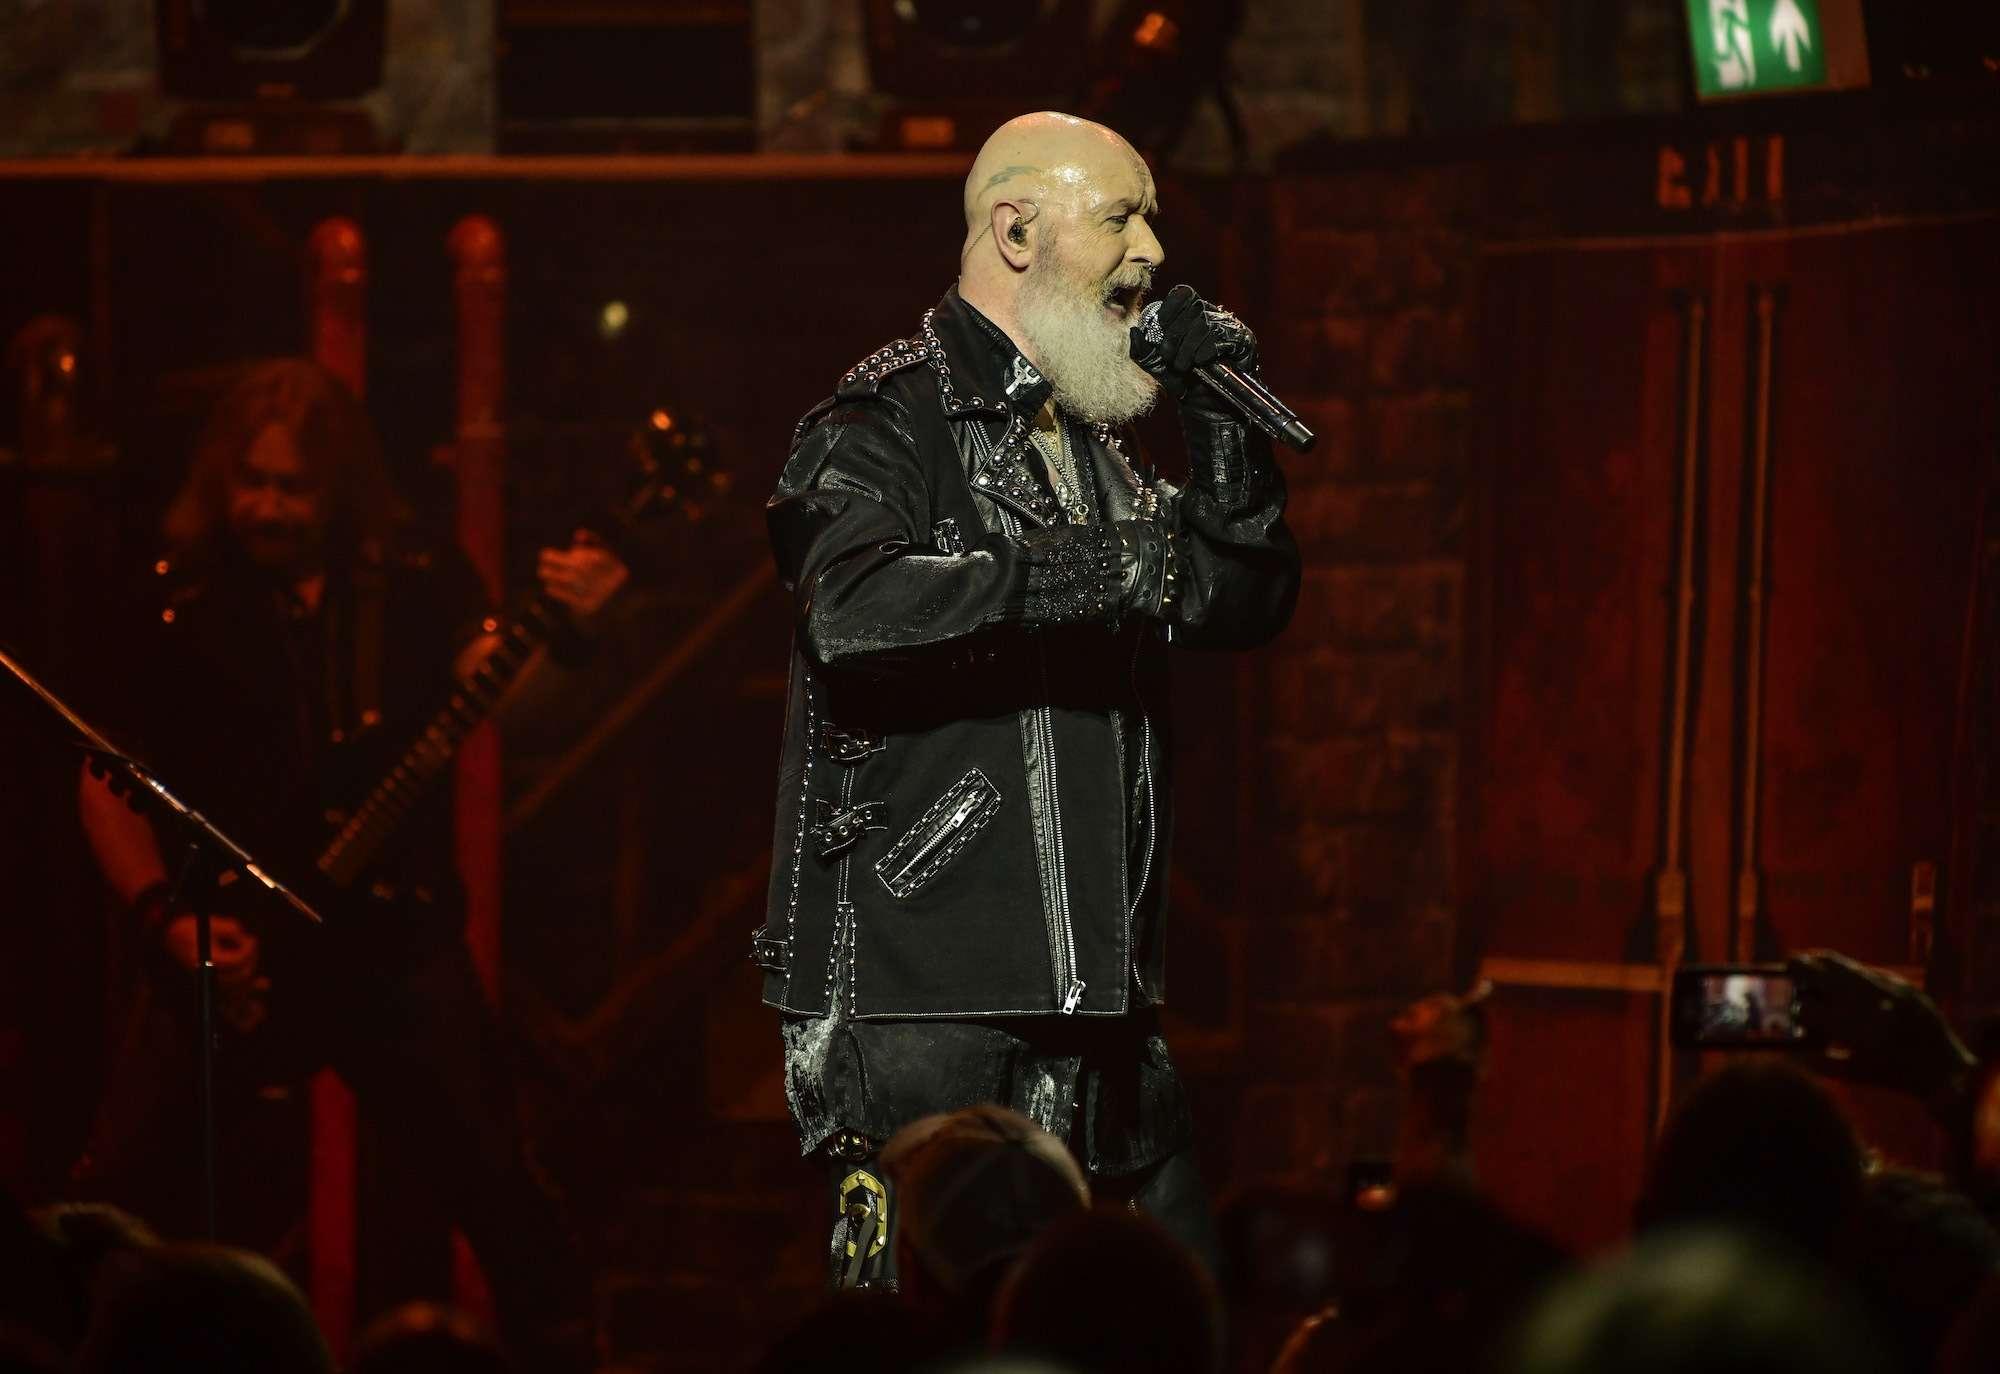 Judas Priest Live at Rosemont Theatre [GALLERY] 10